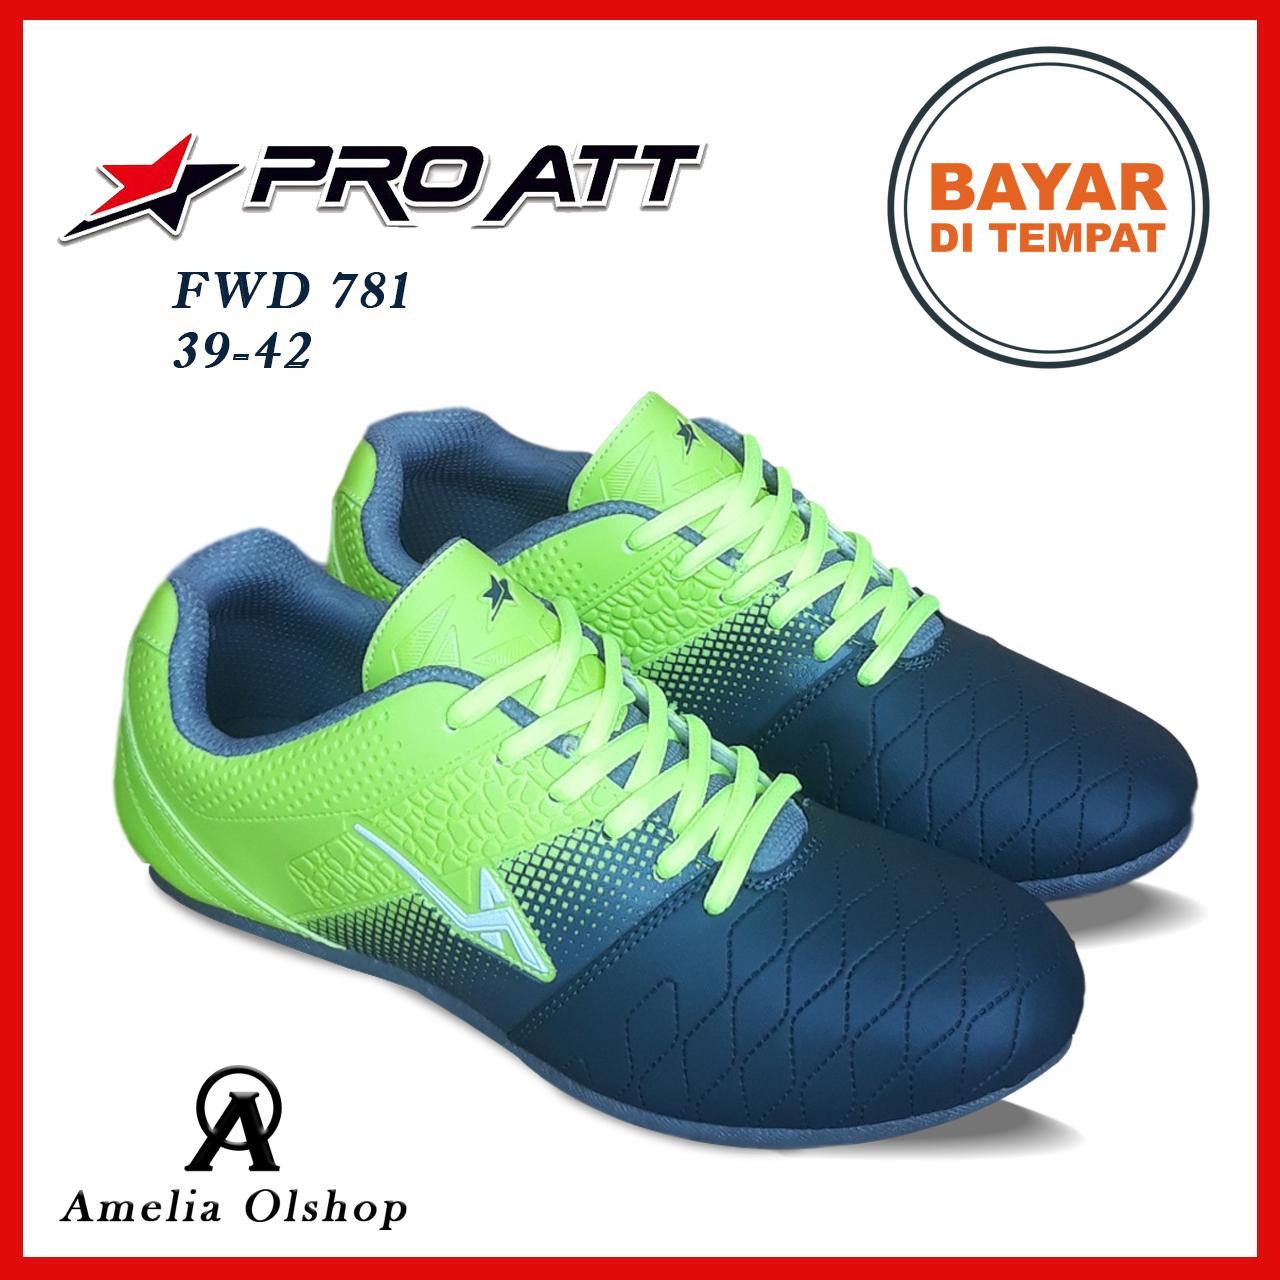 Amelia Olshop - Sepatu Futsal PRO ATT FWD 781 39-42   Sepatu Futsal Pria 2c8780780c